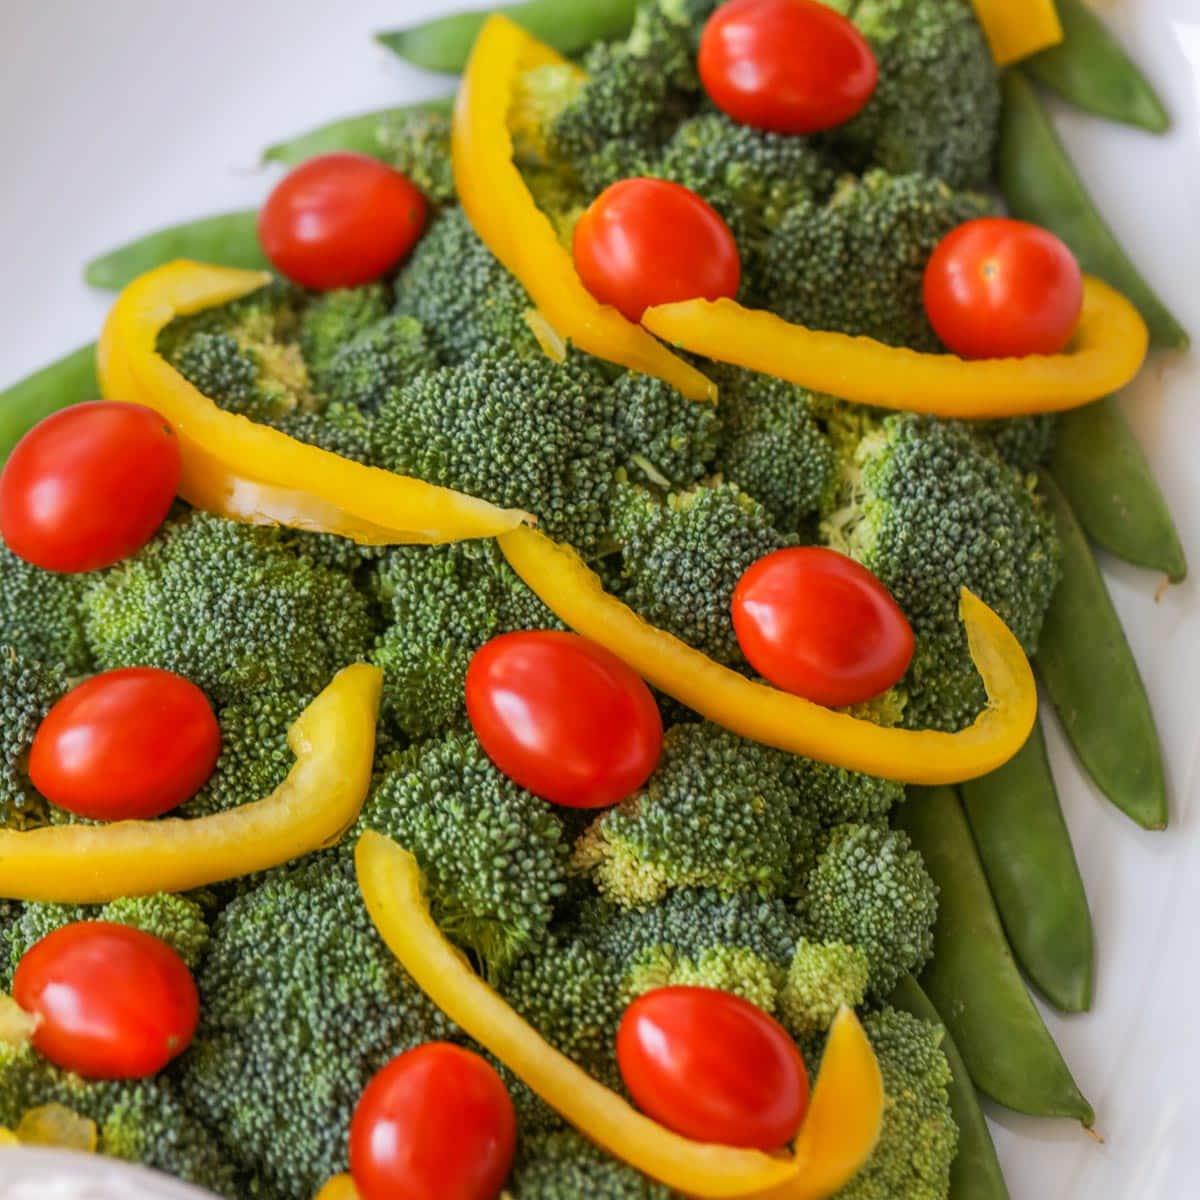 Assembled Christmas tree veggie platter on a white plate